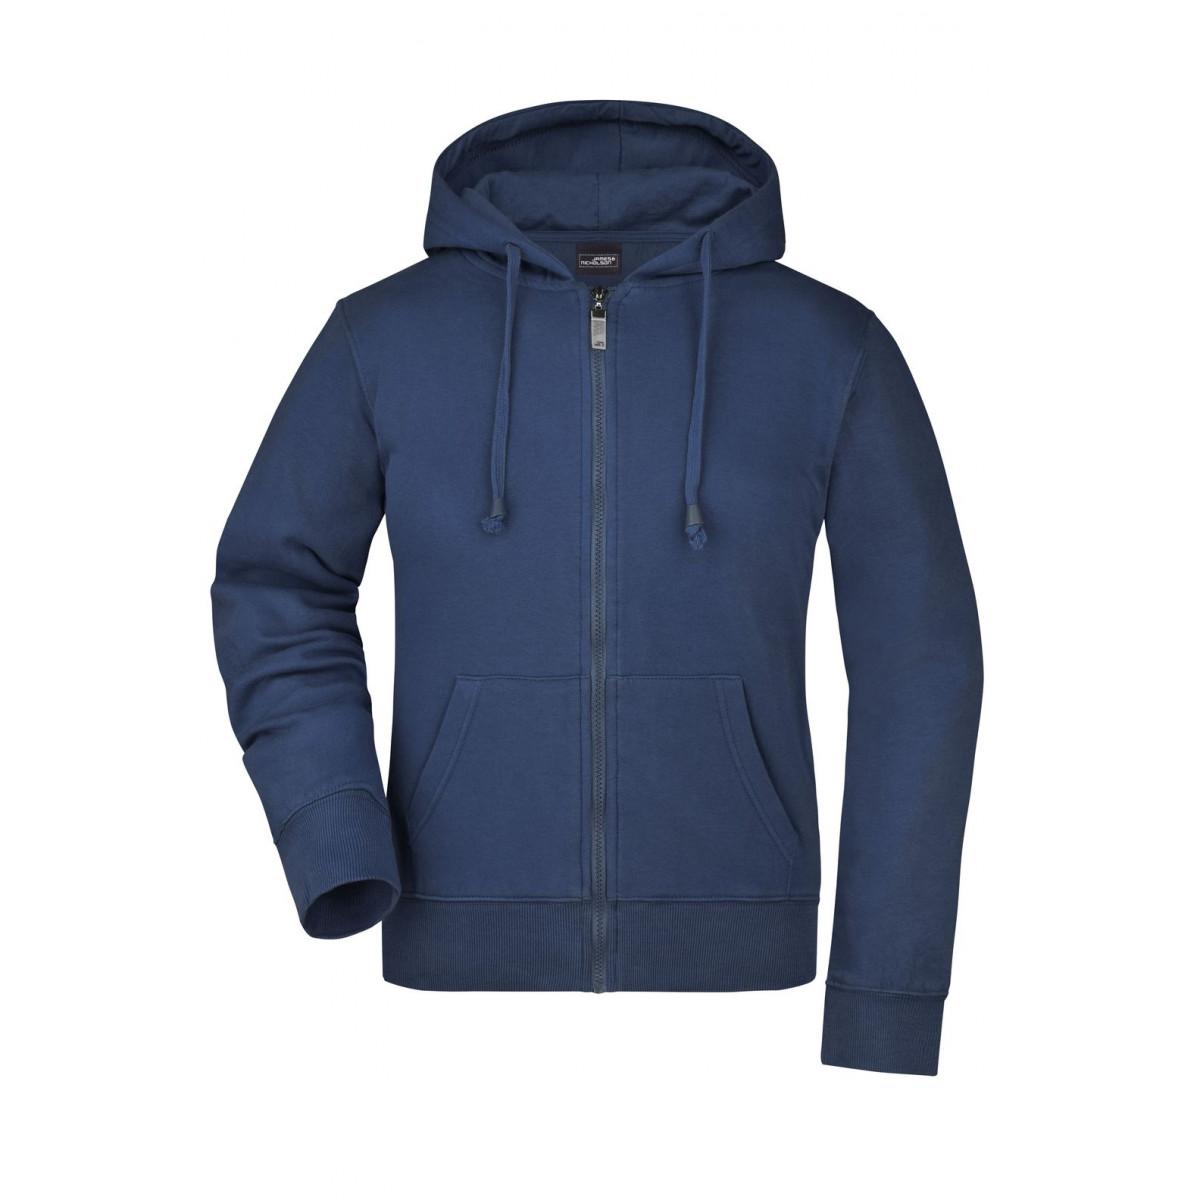 Толстовка женская JN053 Ladies Hooded Jacket - Темно-синий